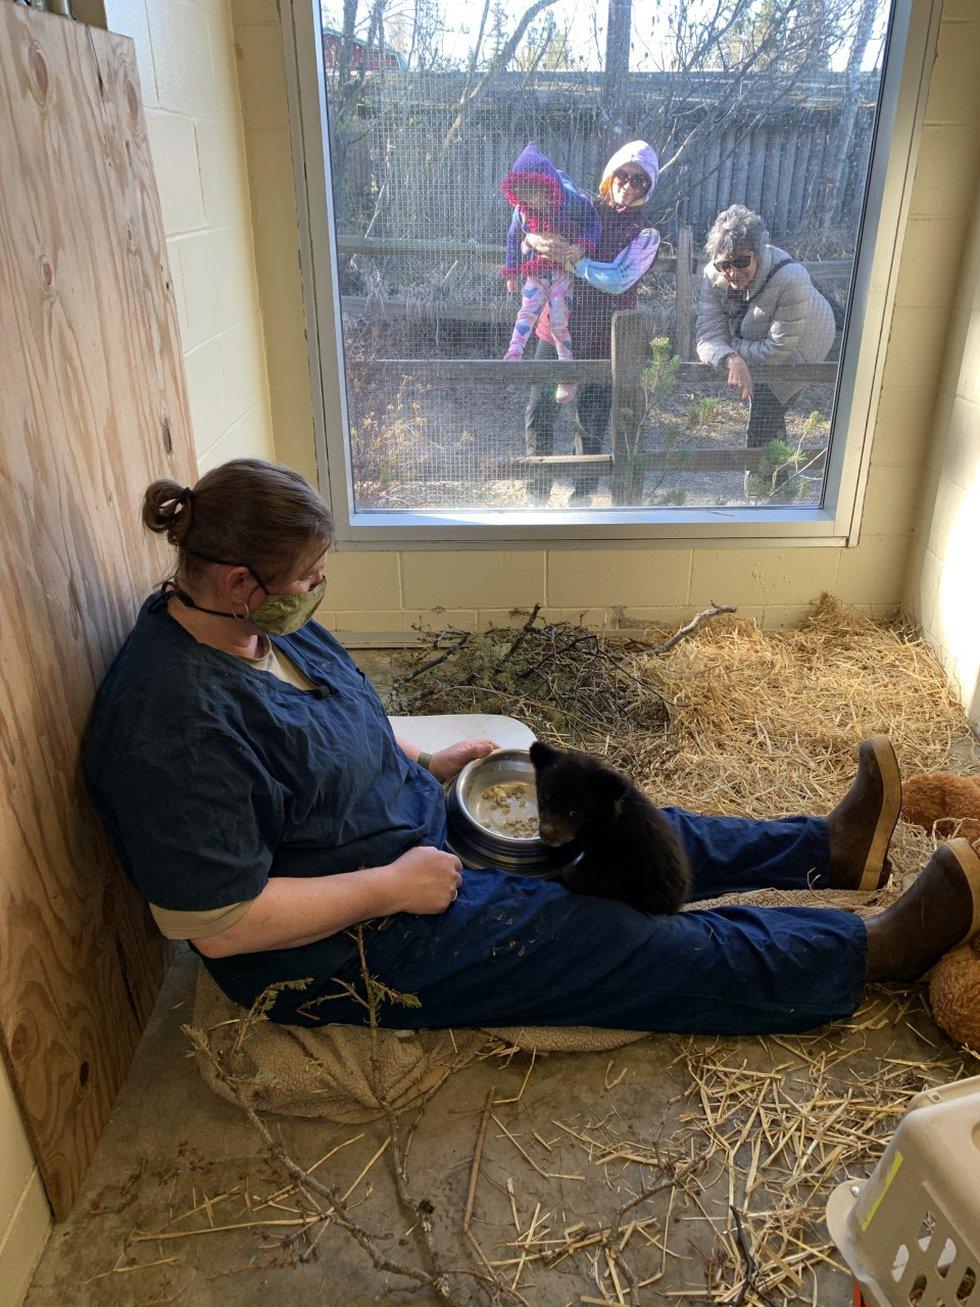 Alaska Zoo Curator Shannon Jensen feeds an orphaned black bear cub in the zoo infirmary